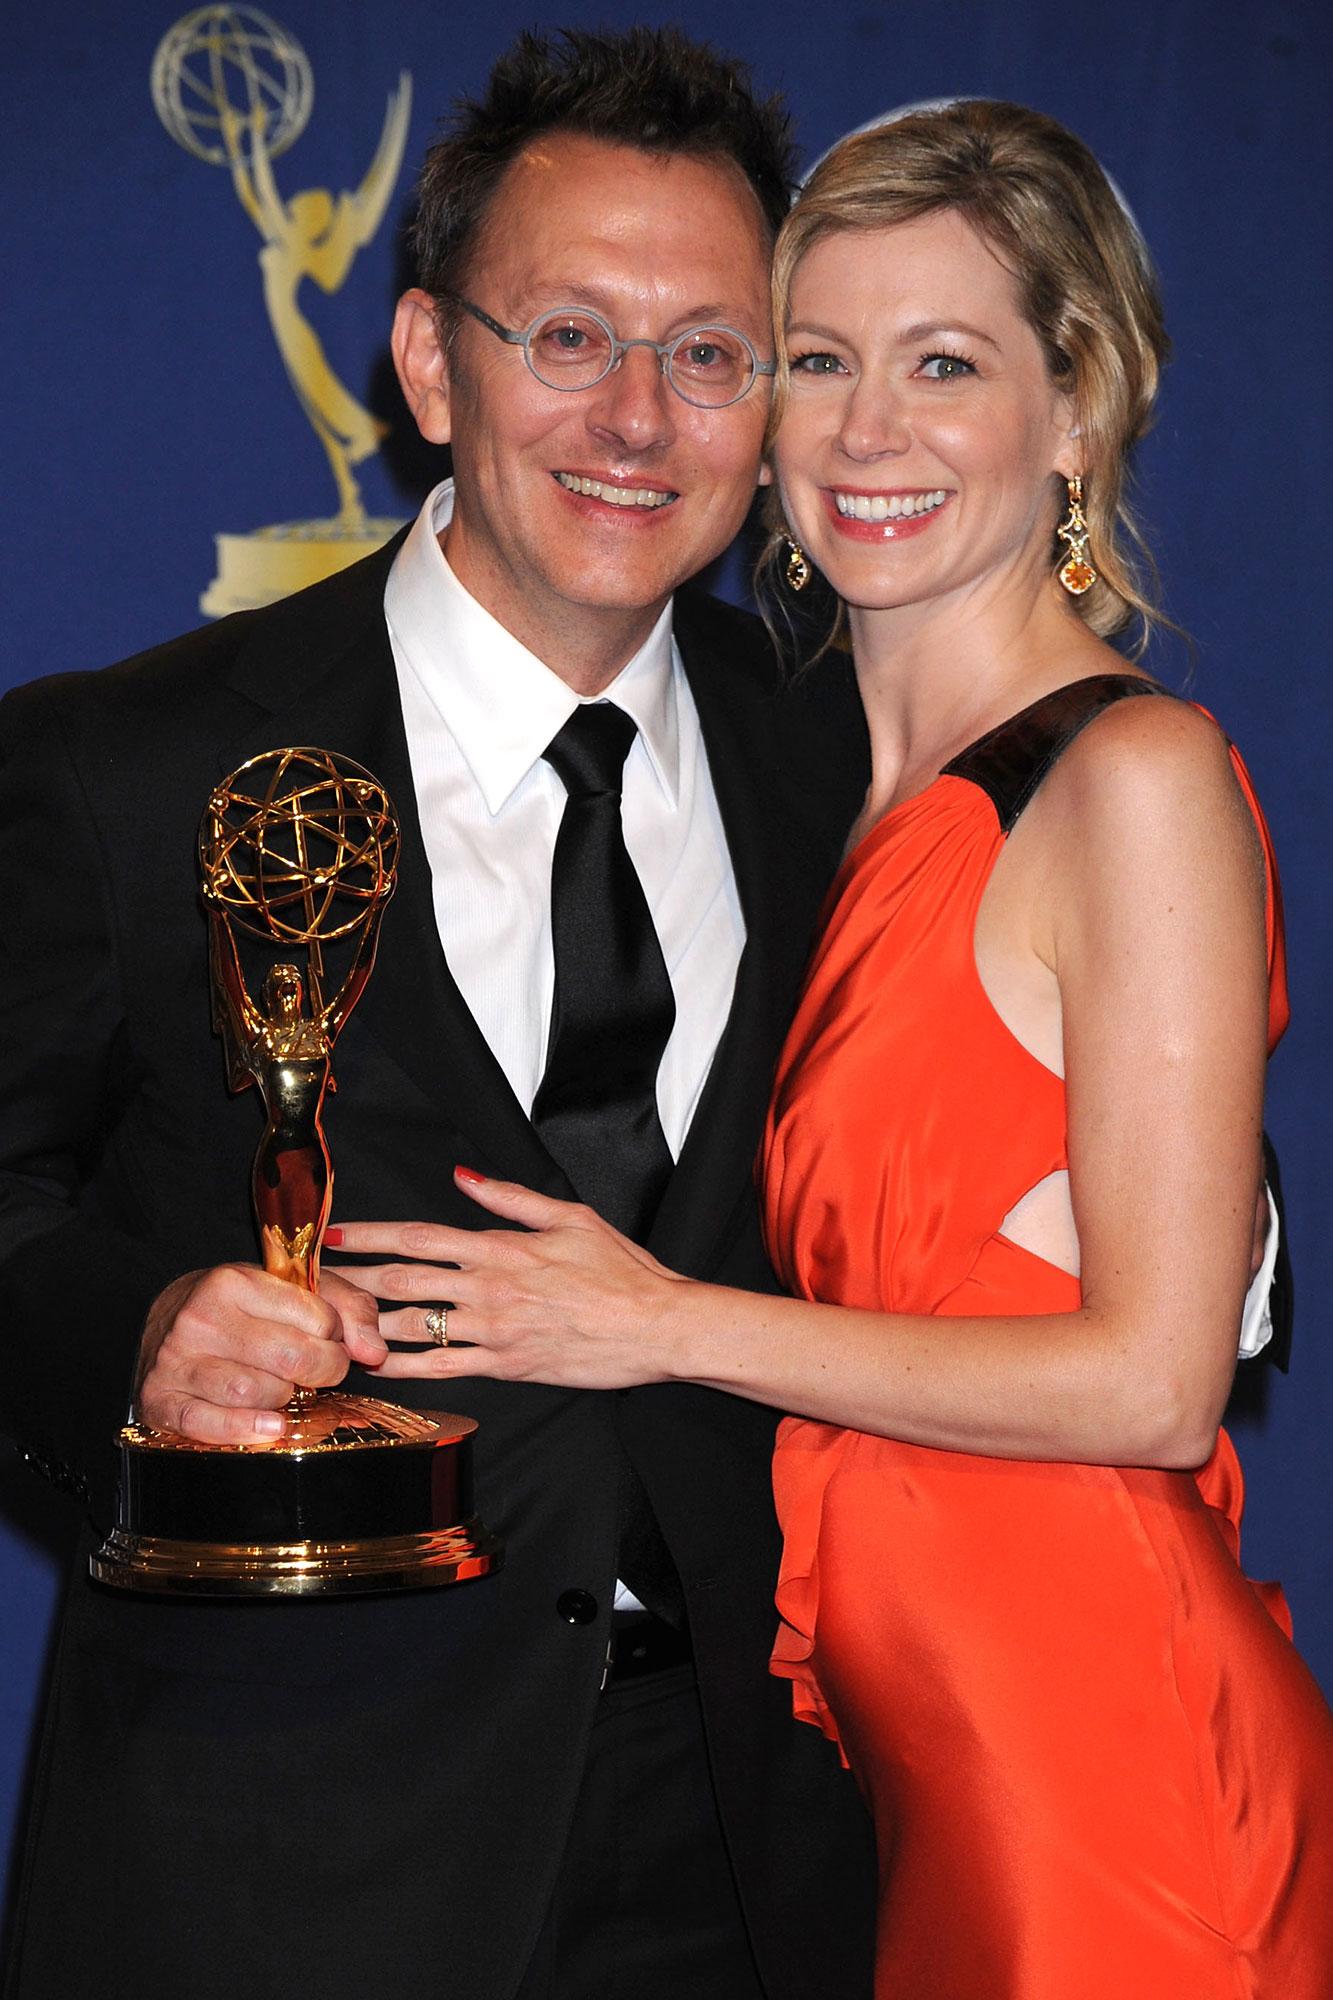 Emmy winning couples